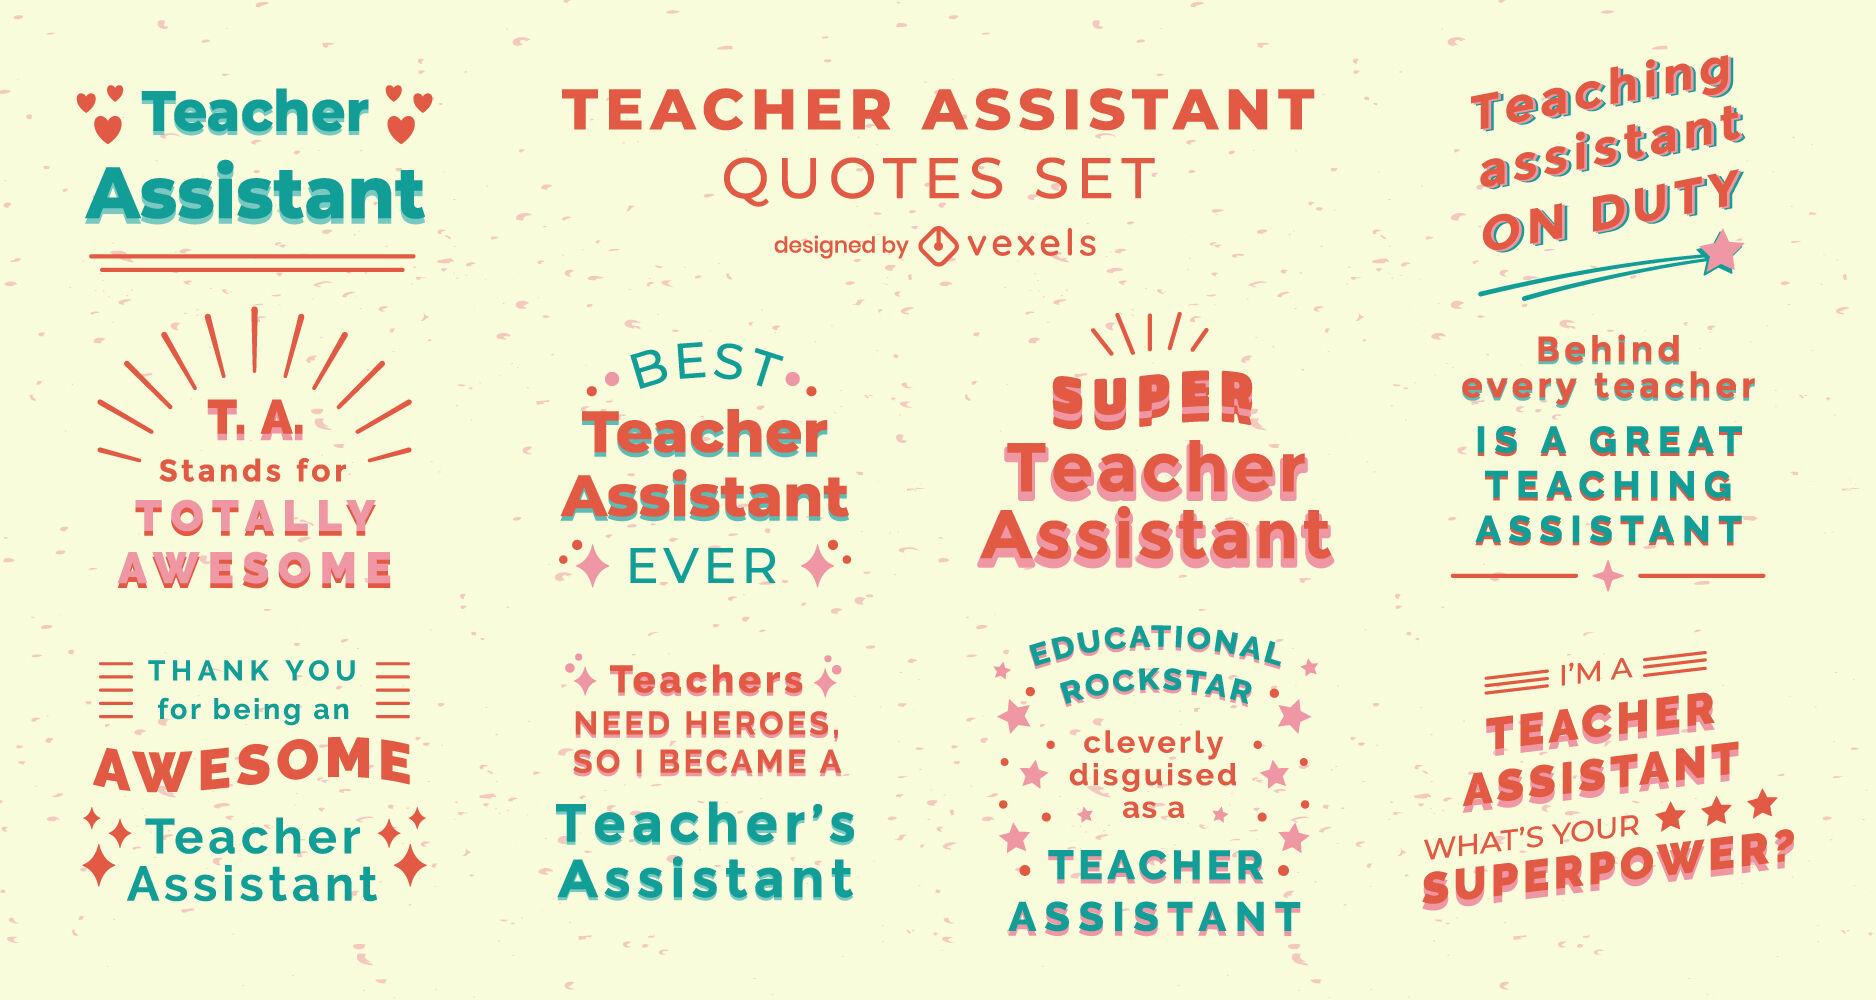 Teacher assistant set of quotes